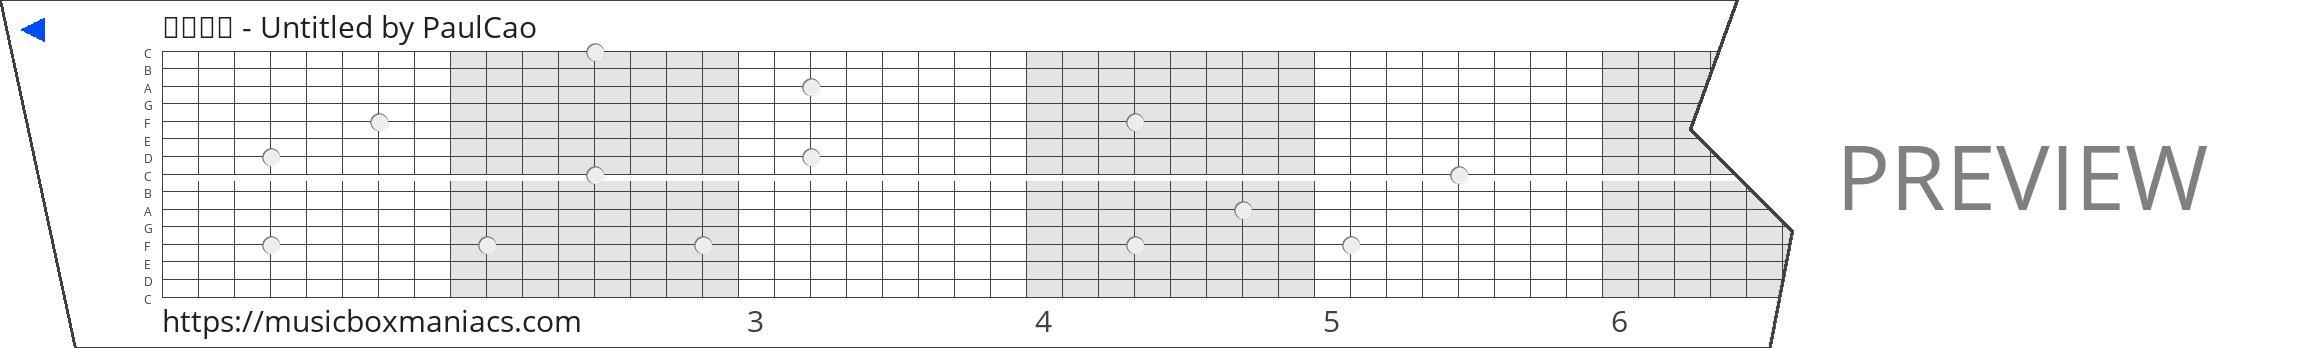 飞鸟与蝉 - Untitled 15 note music box paper strip